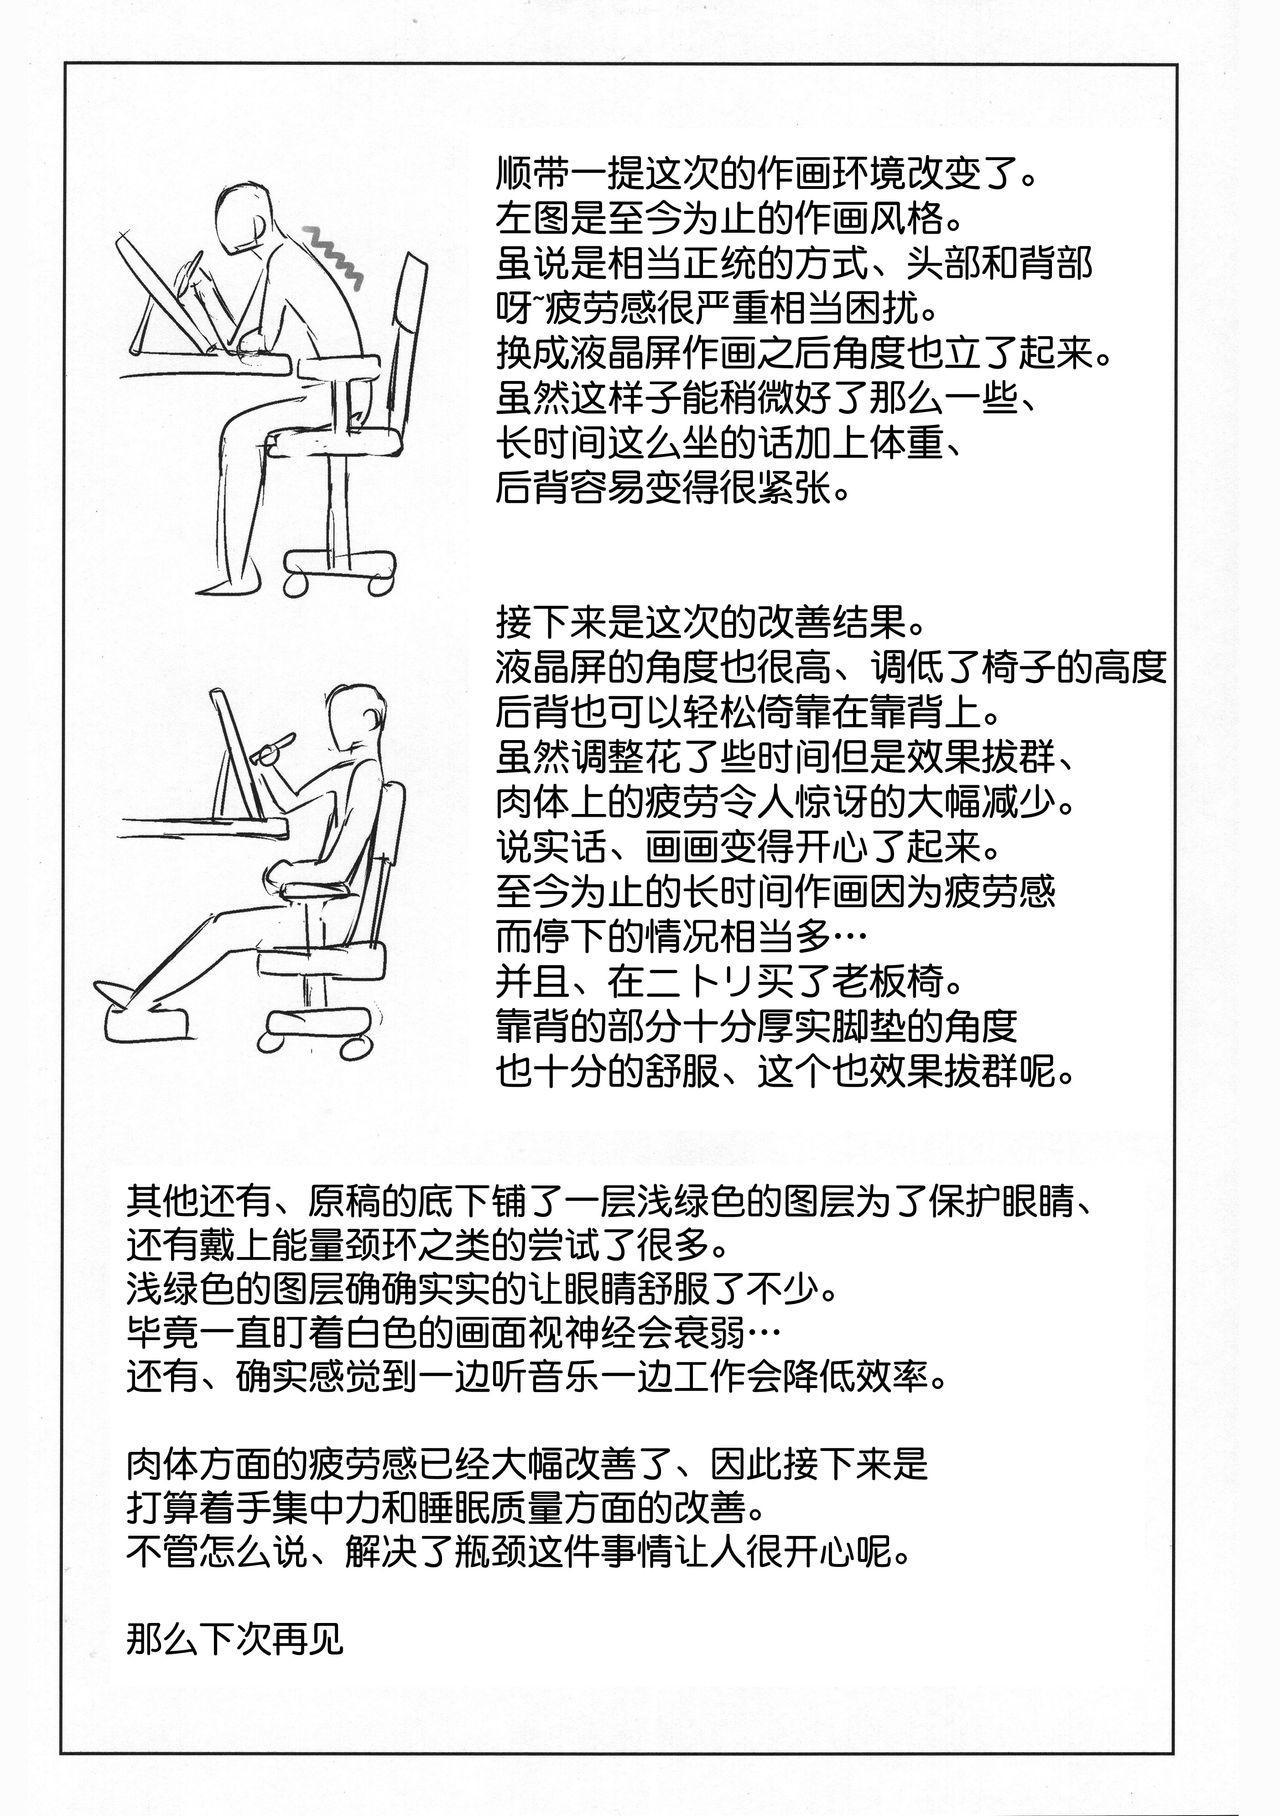 Komi-ke no Kyoudai Asobi 32